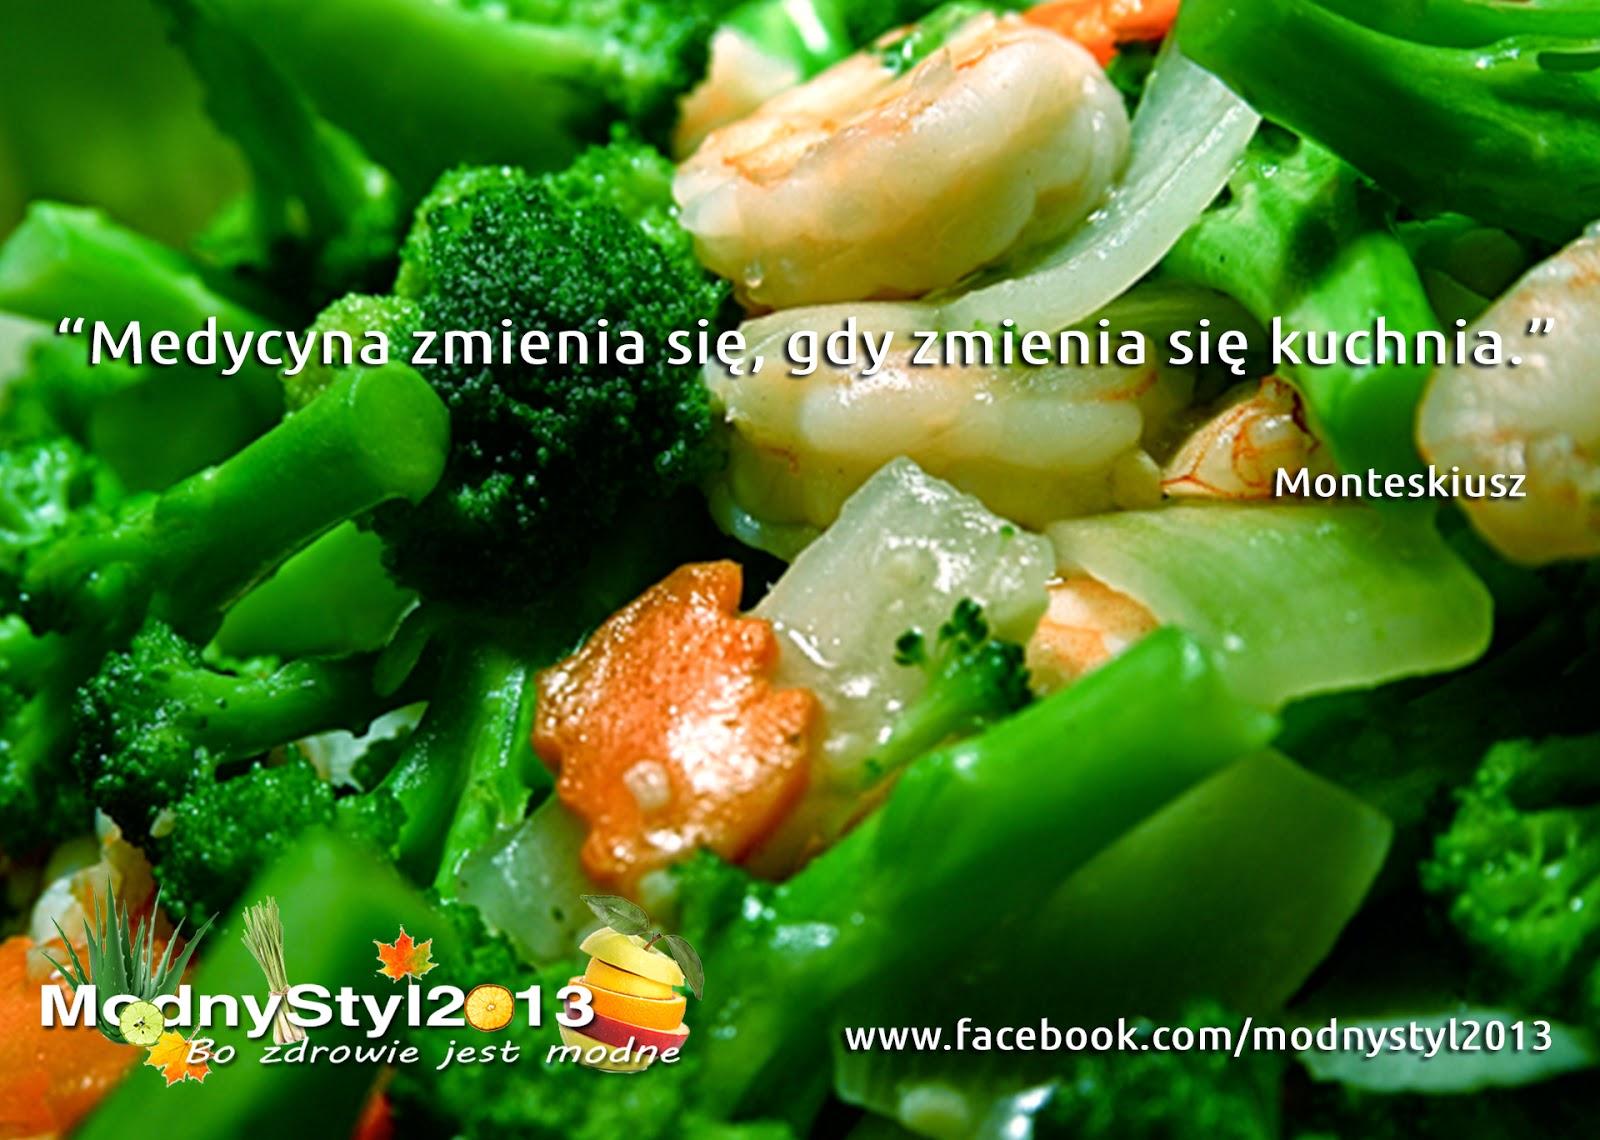 Cytat medycyna a kuchnia według Monteskiusza